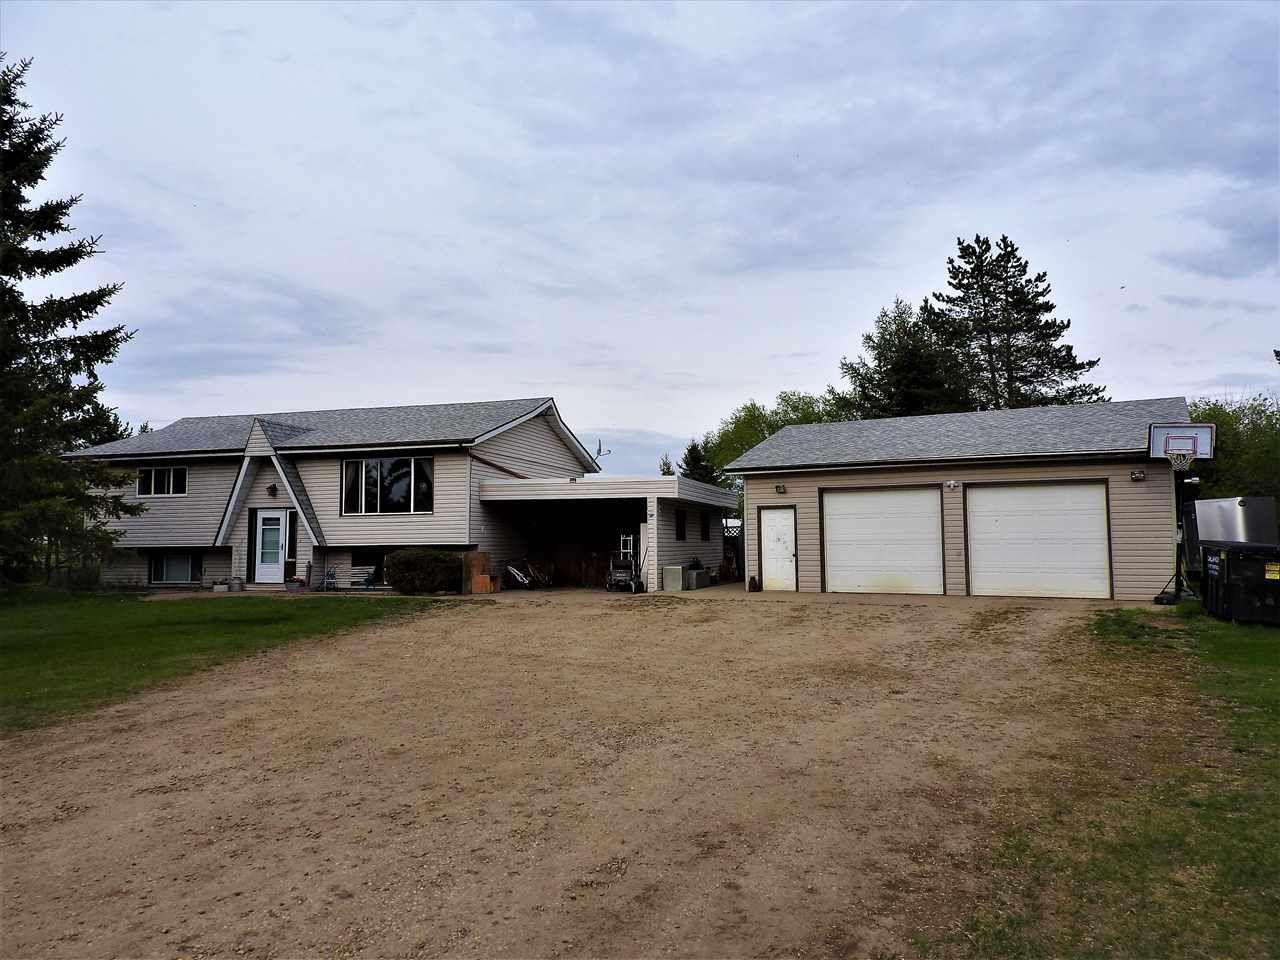 Photo 24: Photos: 55301 RGE RD 262: Rural Sturgeon County House for sale : MLS®# E4158158